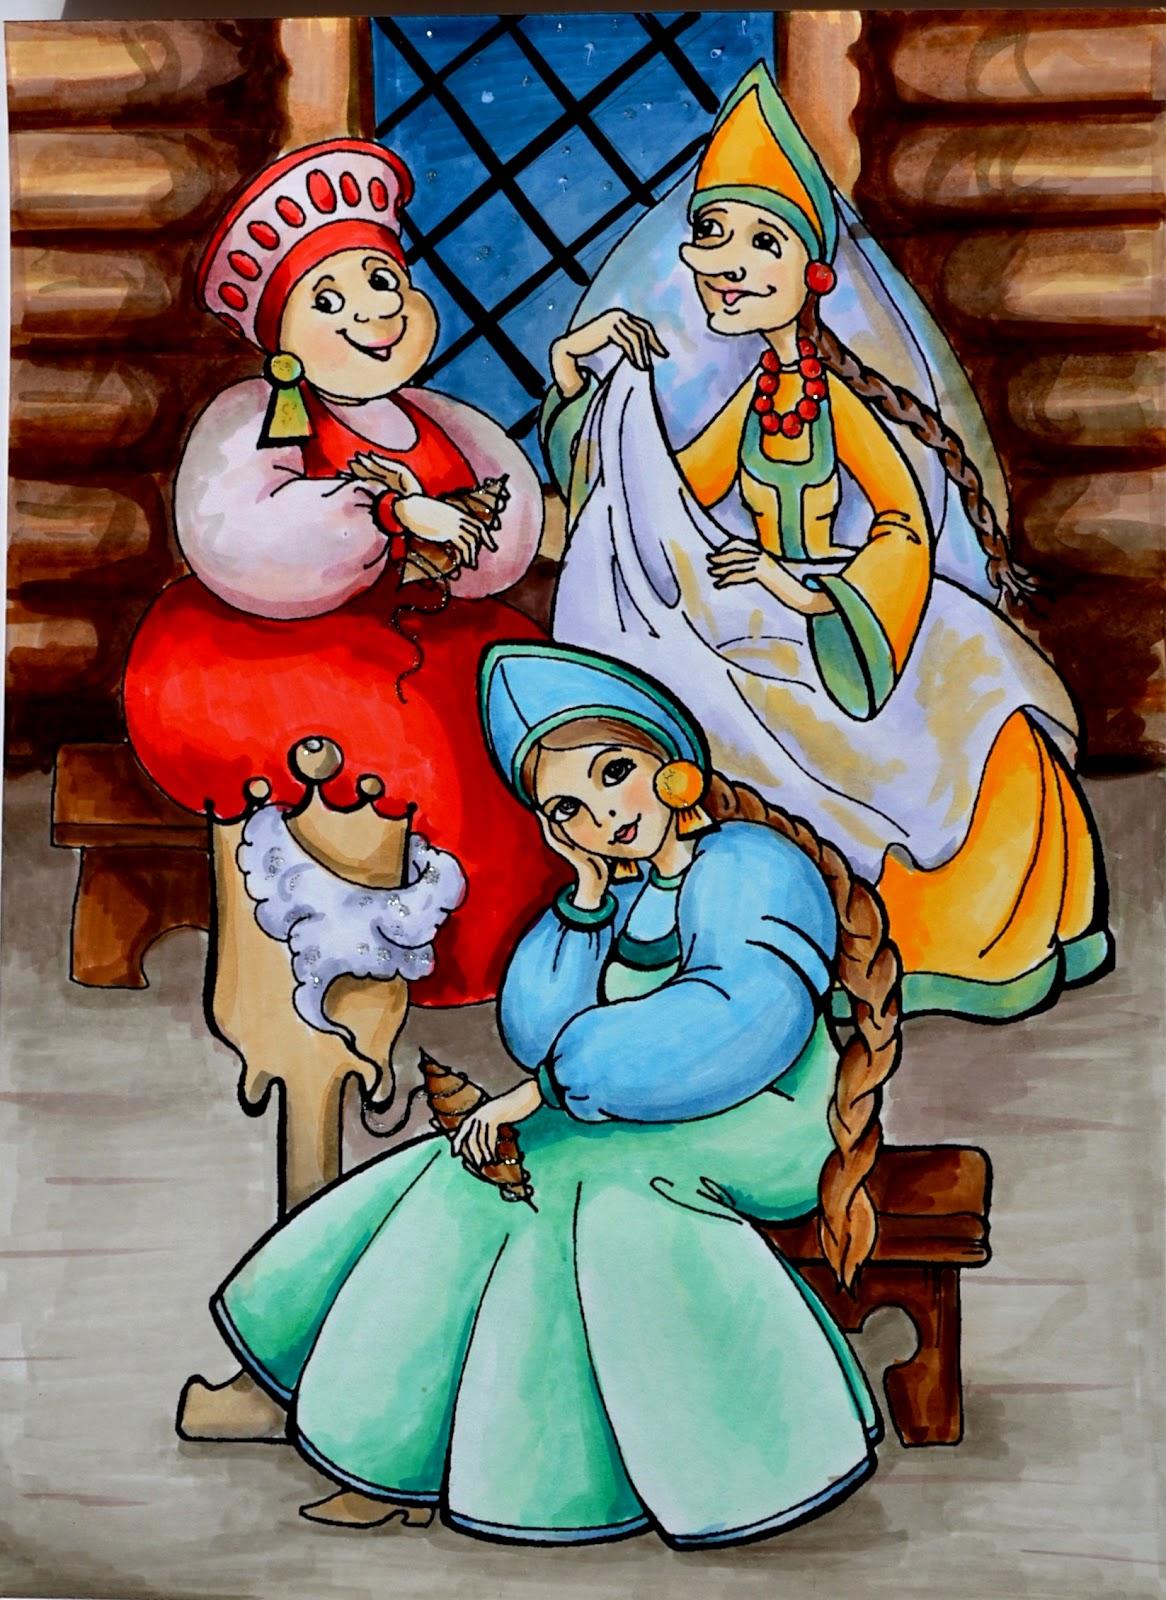 Сказка о царе салтане рисунок лебедя